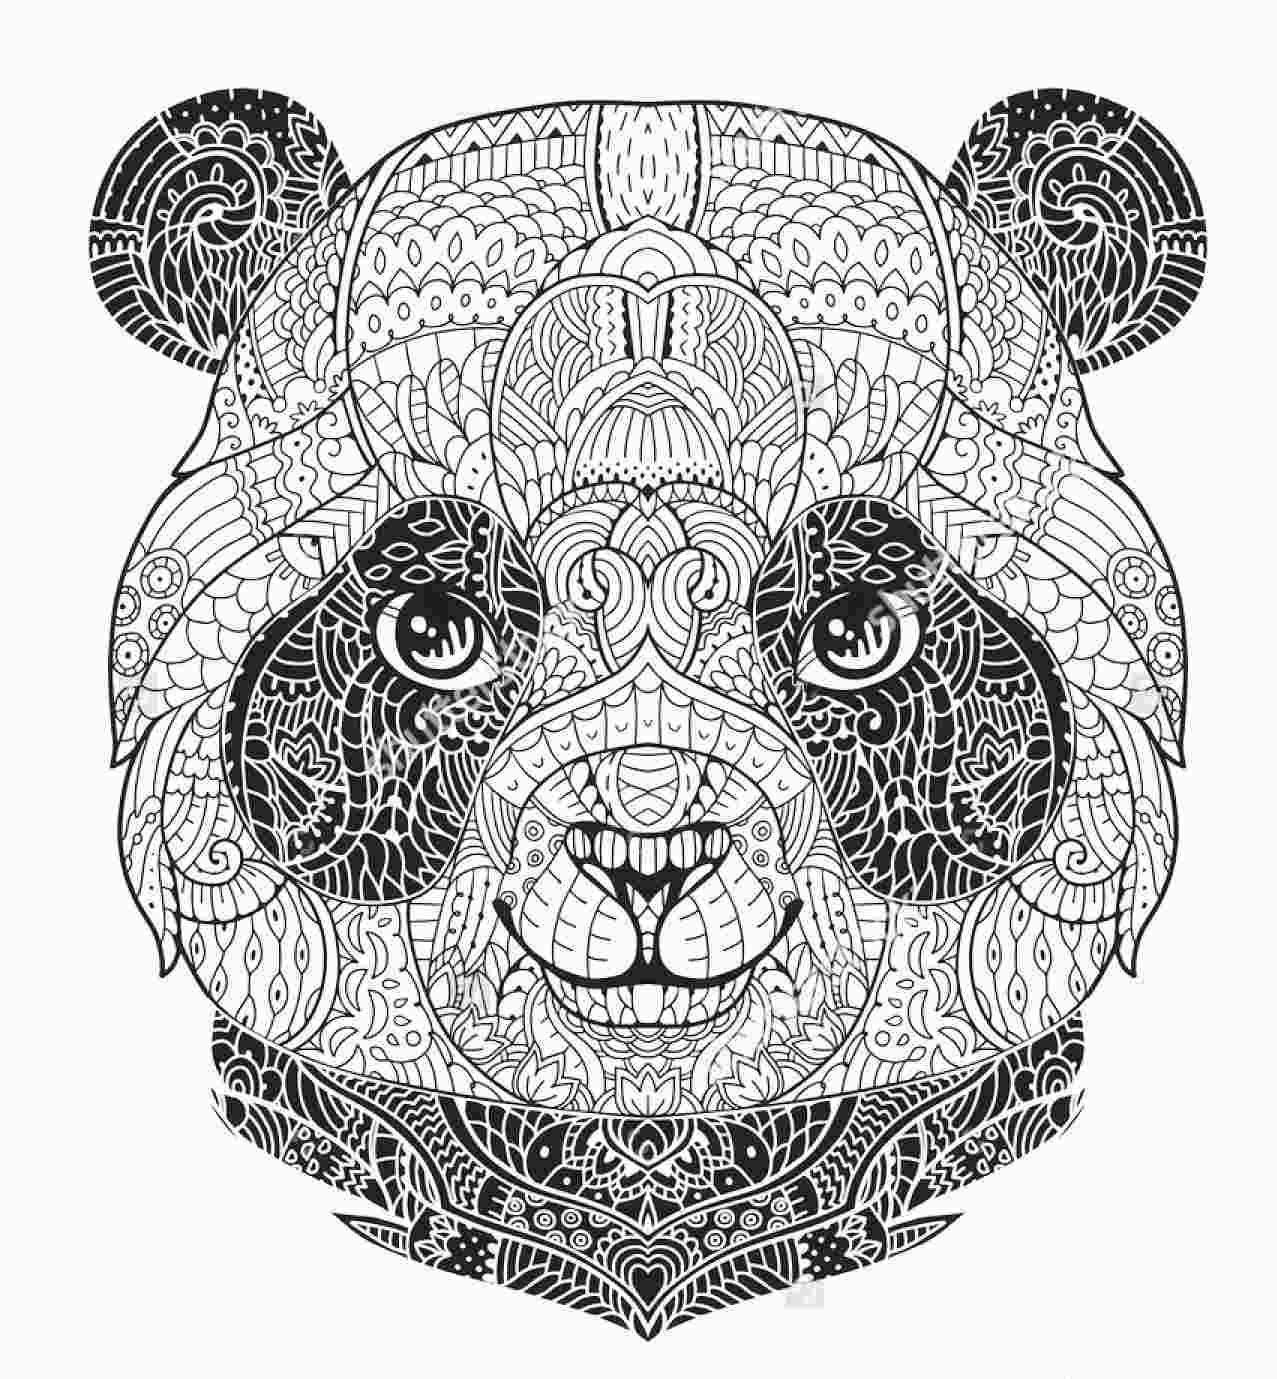 Panda Mandala Coloring Pages Zendoodle Panda Tekening Kleurplaten